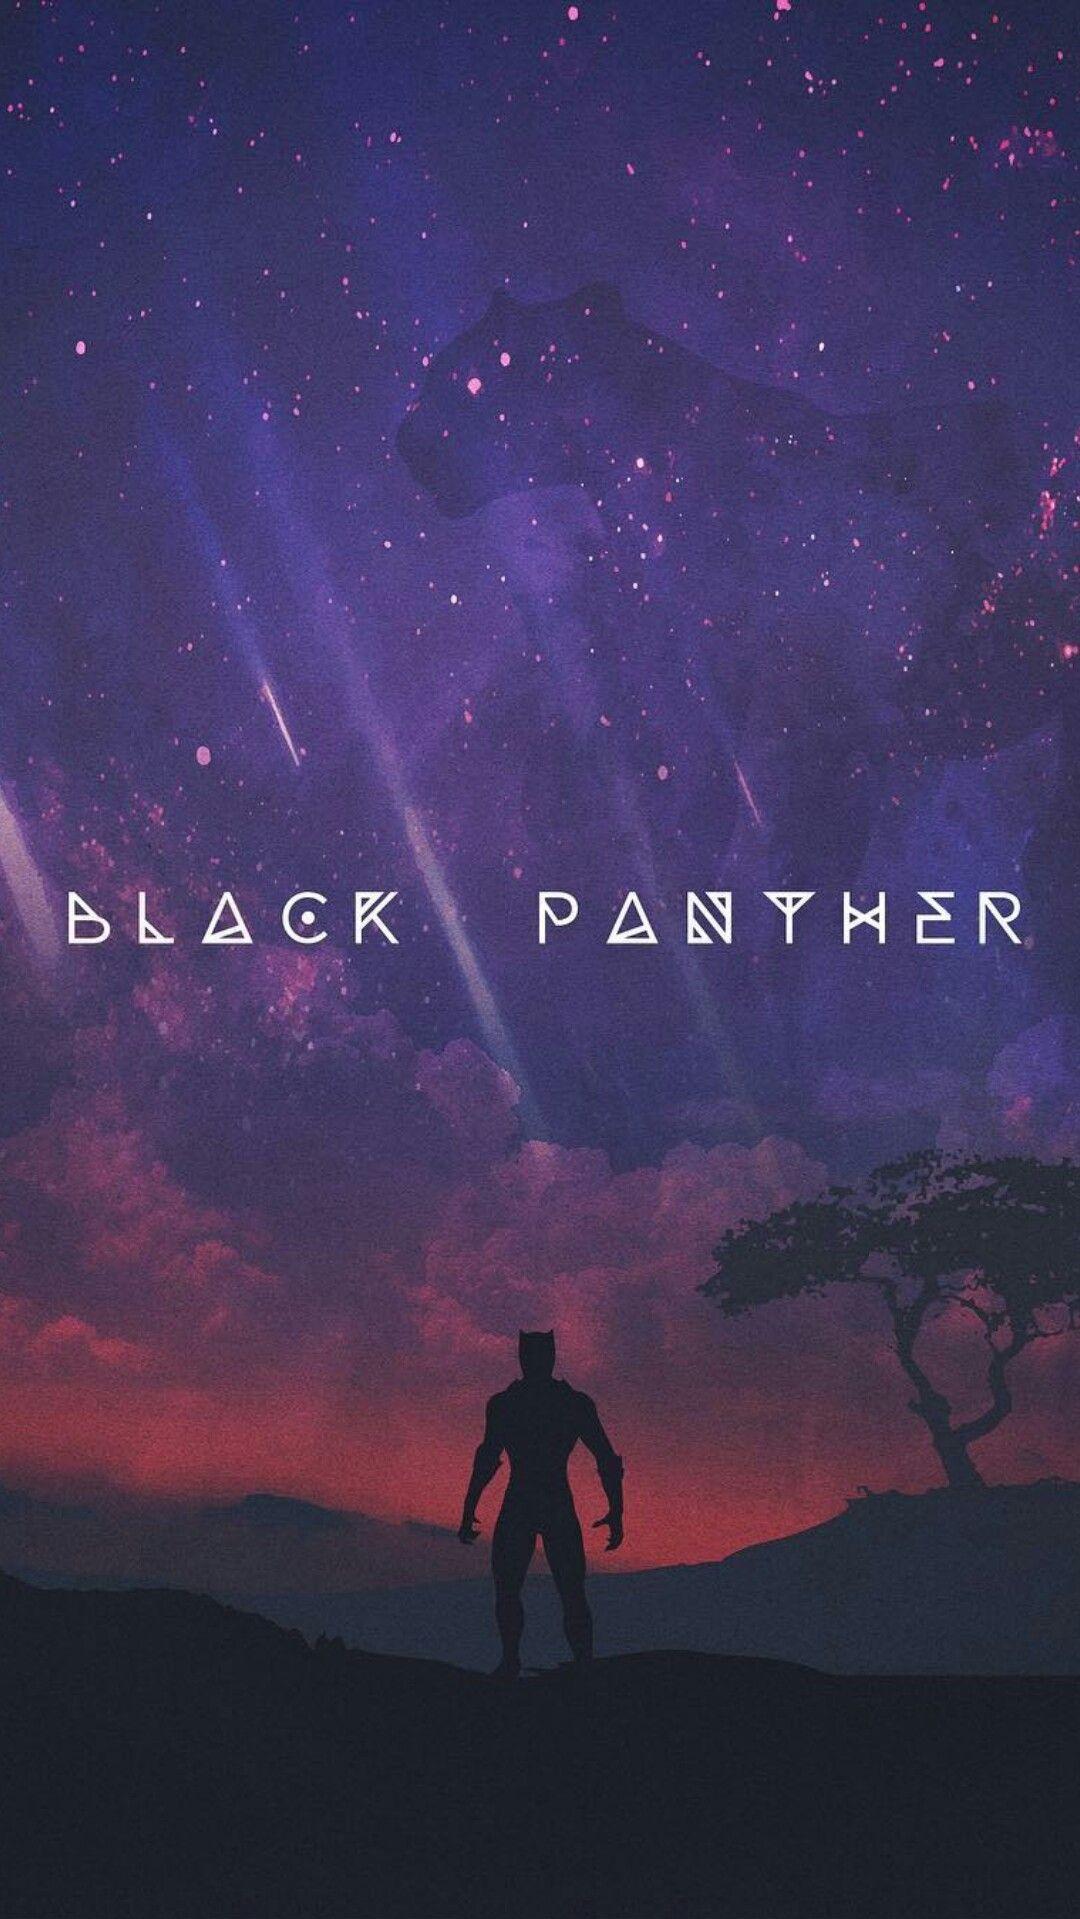 Black Panther Ancestral Plane Wallpaper : black, panther, ancestral, plane, wallpaper, Wakanda, Wallpaper, Posted, Ethan, Sellers